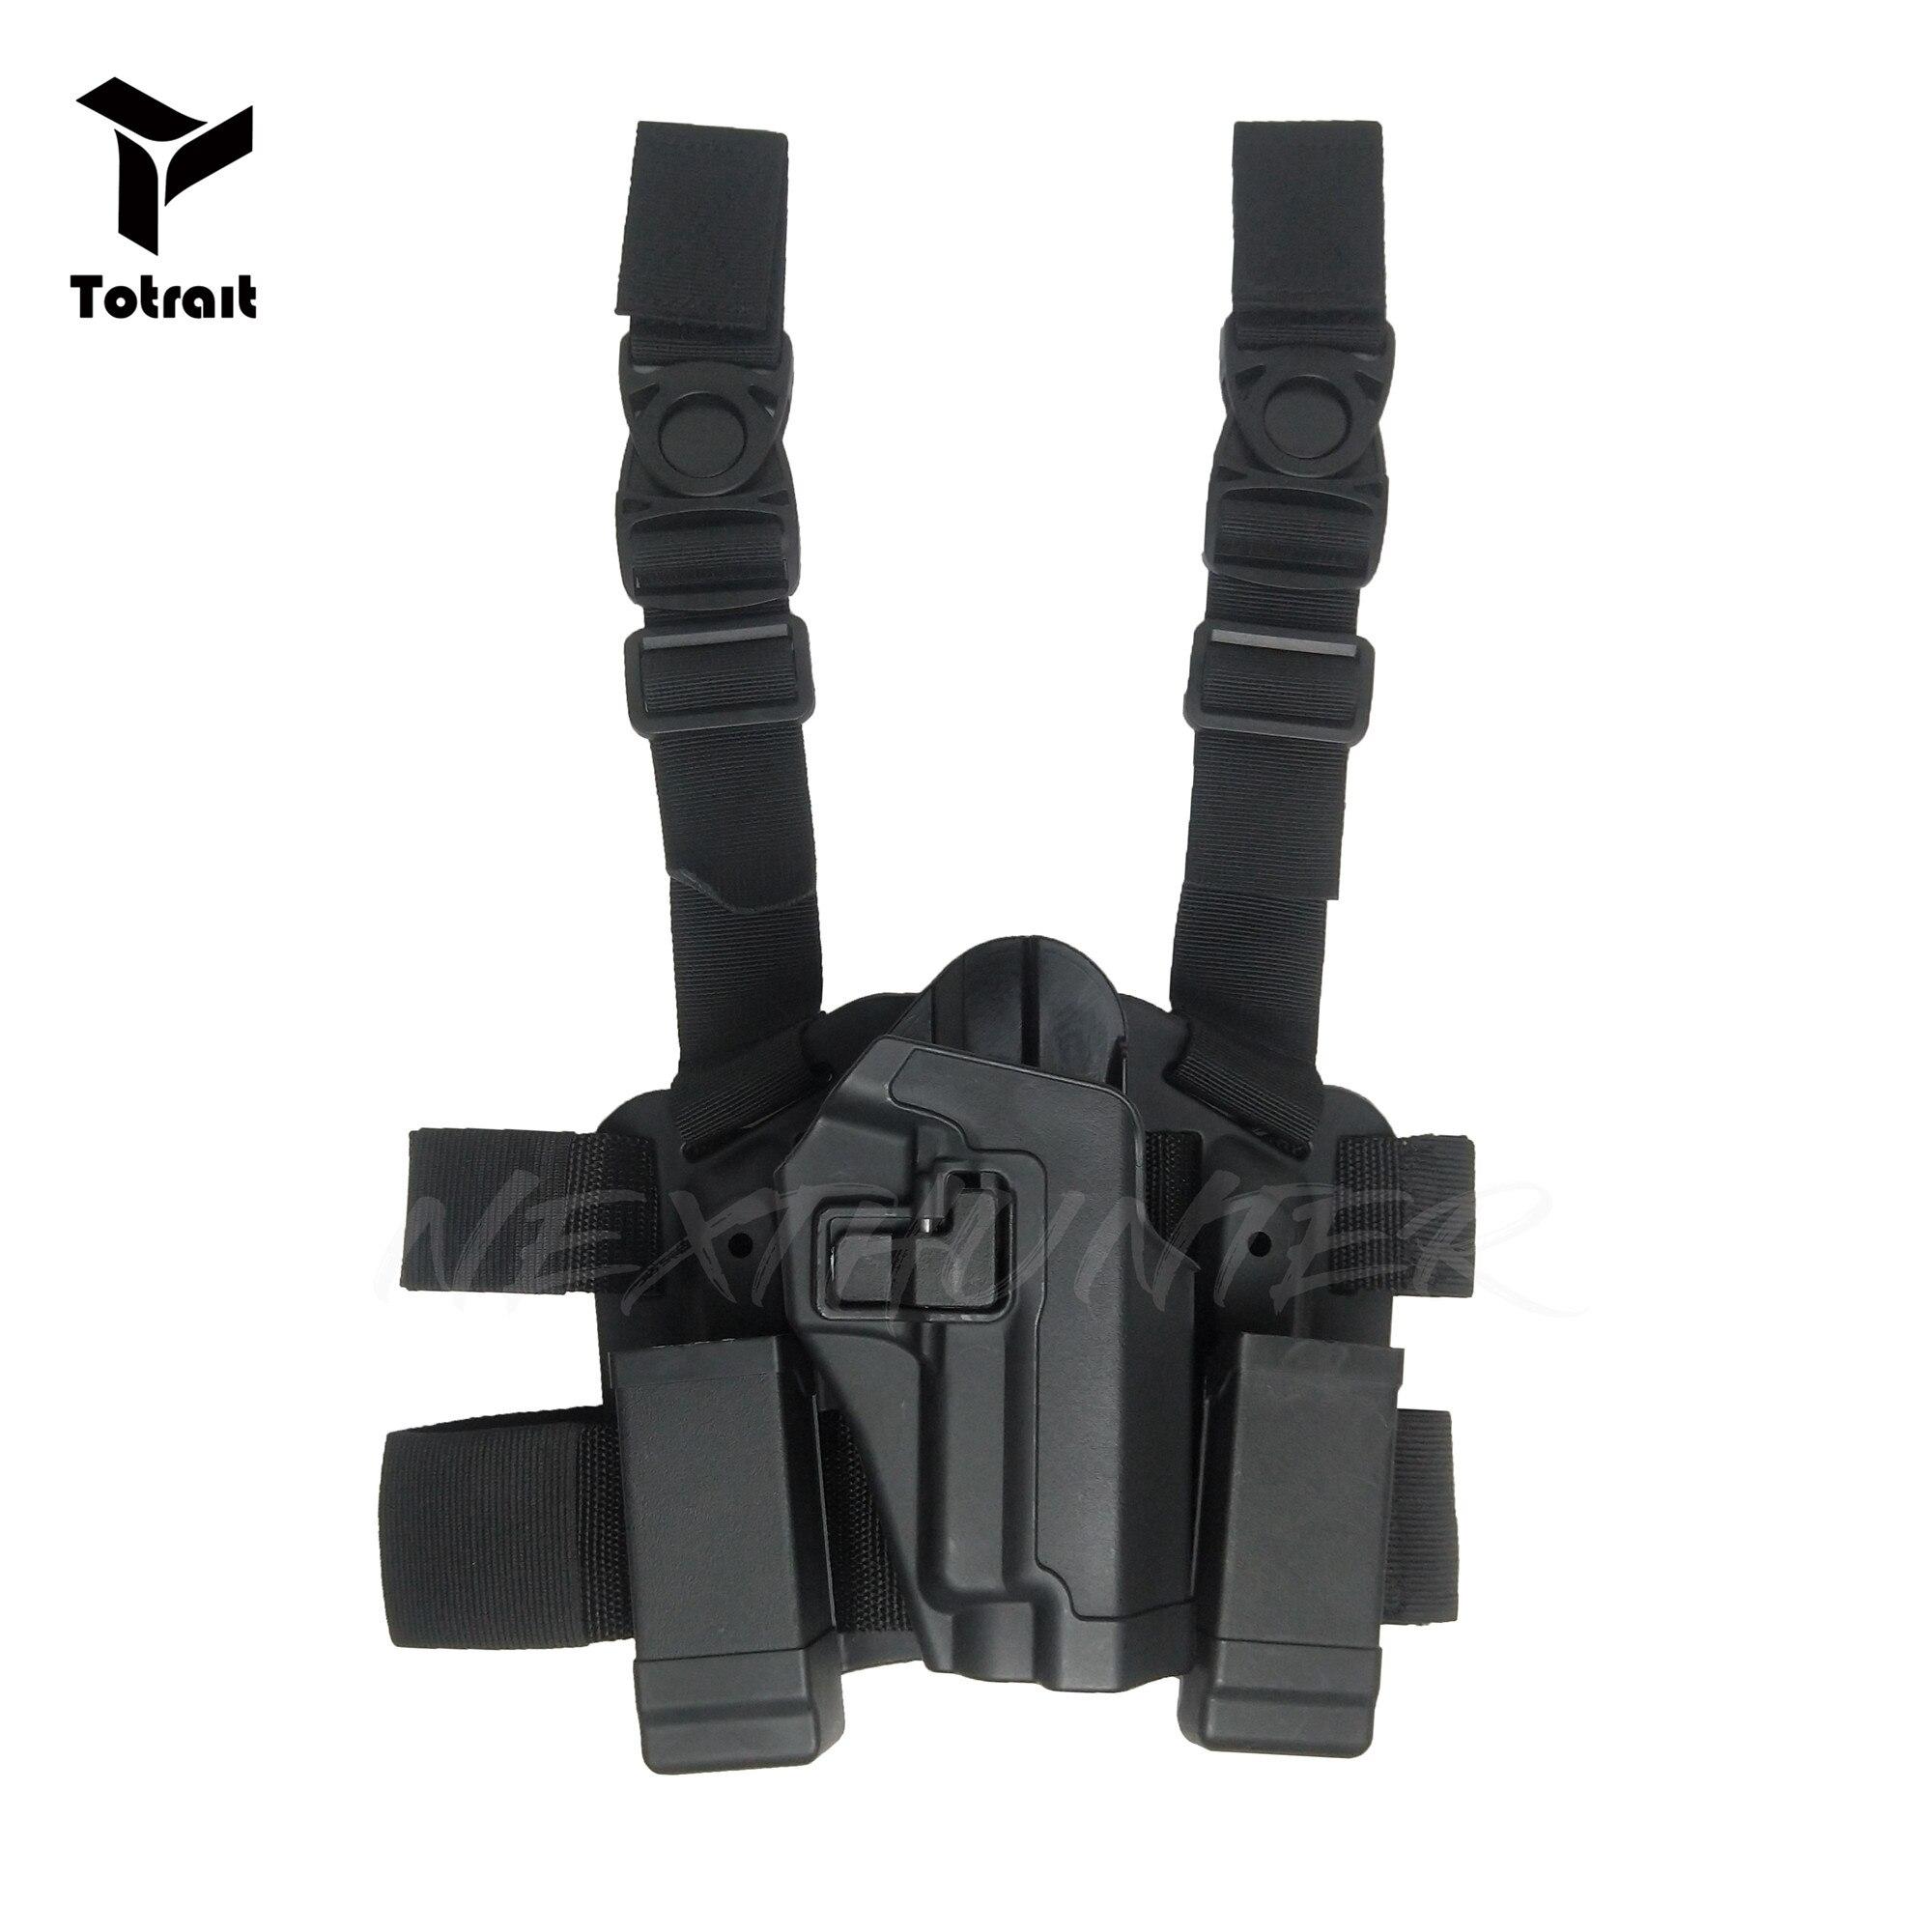 BlackHawk CQC SIG P226 P220 Tactical Leg Holster RH Drop Leg Pouch Hunting Airsoft Accessories